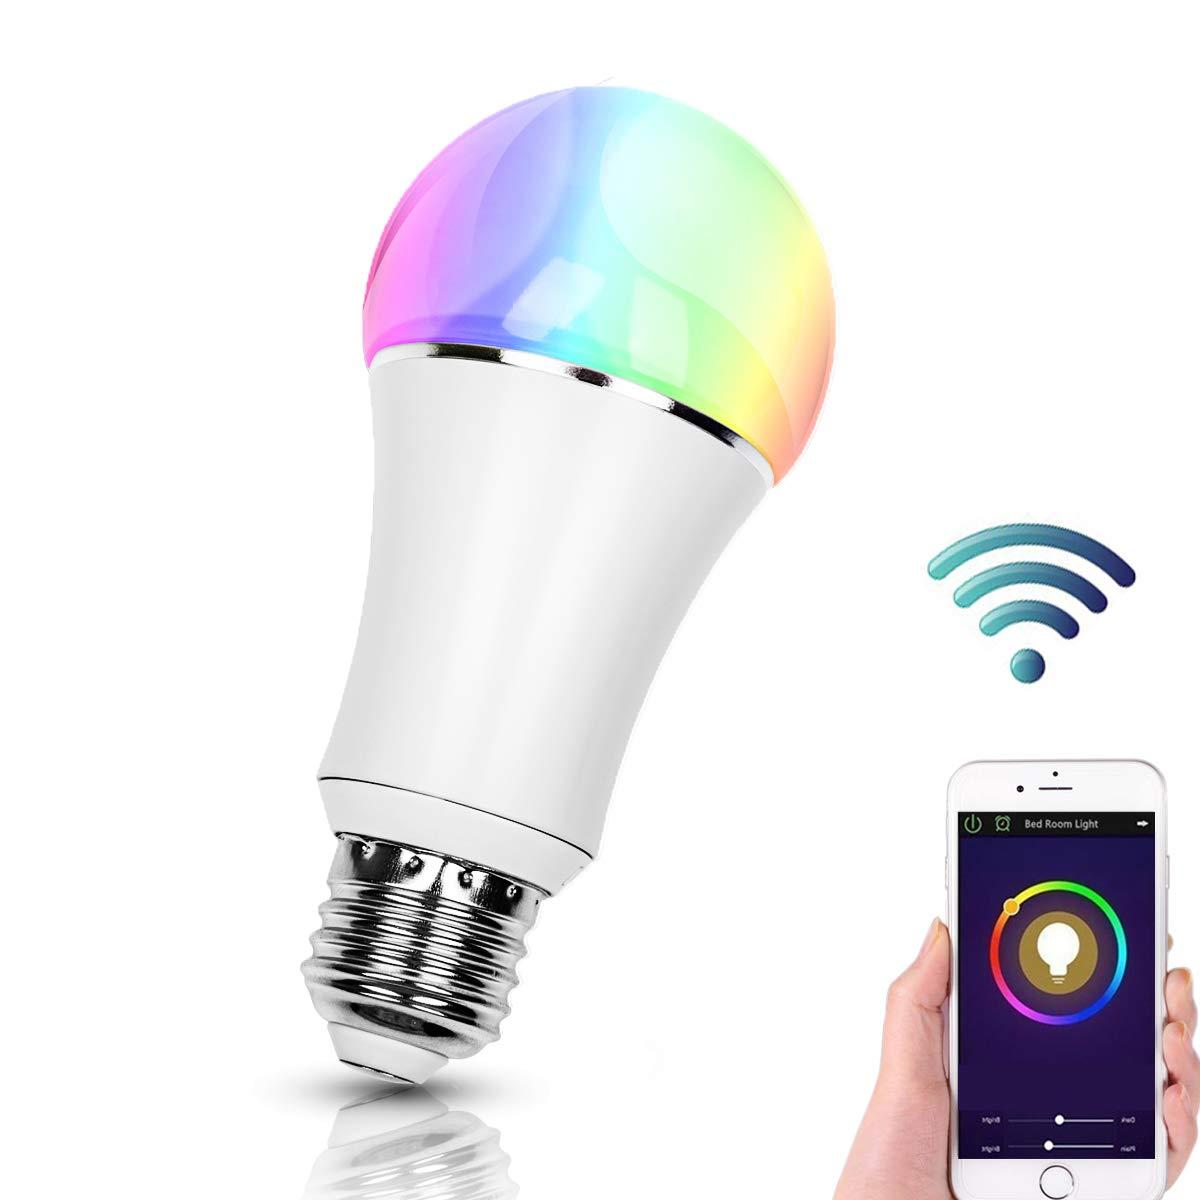 Smart Alexa Lampe,FEYG Zwei Pack Wi-Fi E27 LED Smart Glühbirne RGB Dimmbar Kompatibel Mit  Alexa,steuerbar via App, Sbis zu 16 Millionen Farben,wählen Sie zuerst Smart Home … wählen Sie zuerst Smart Home ...